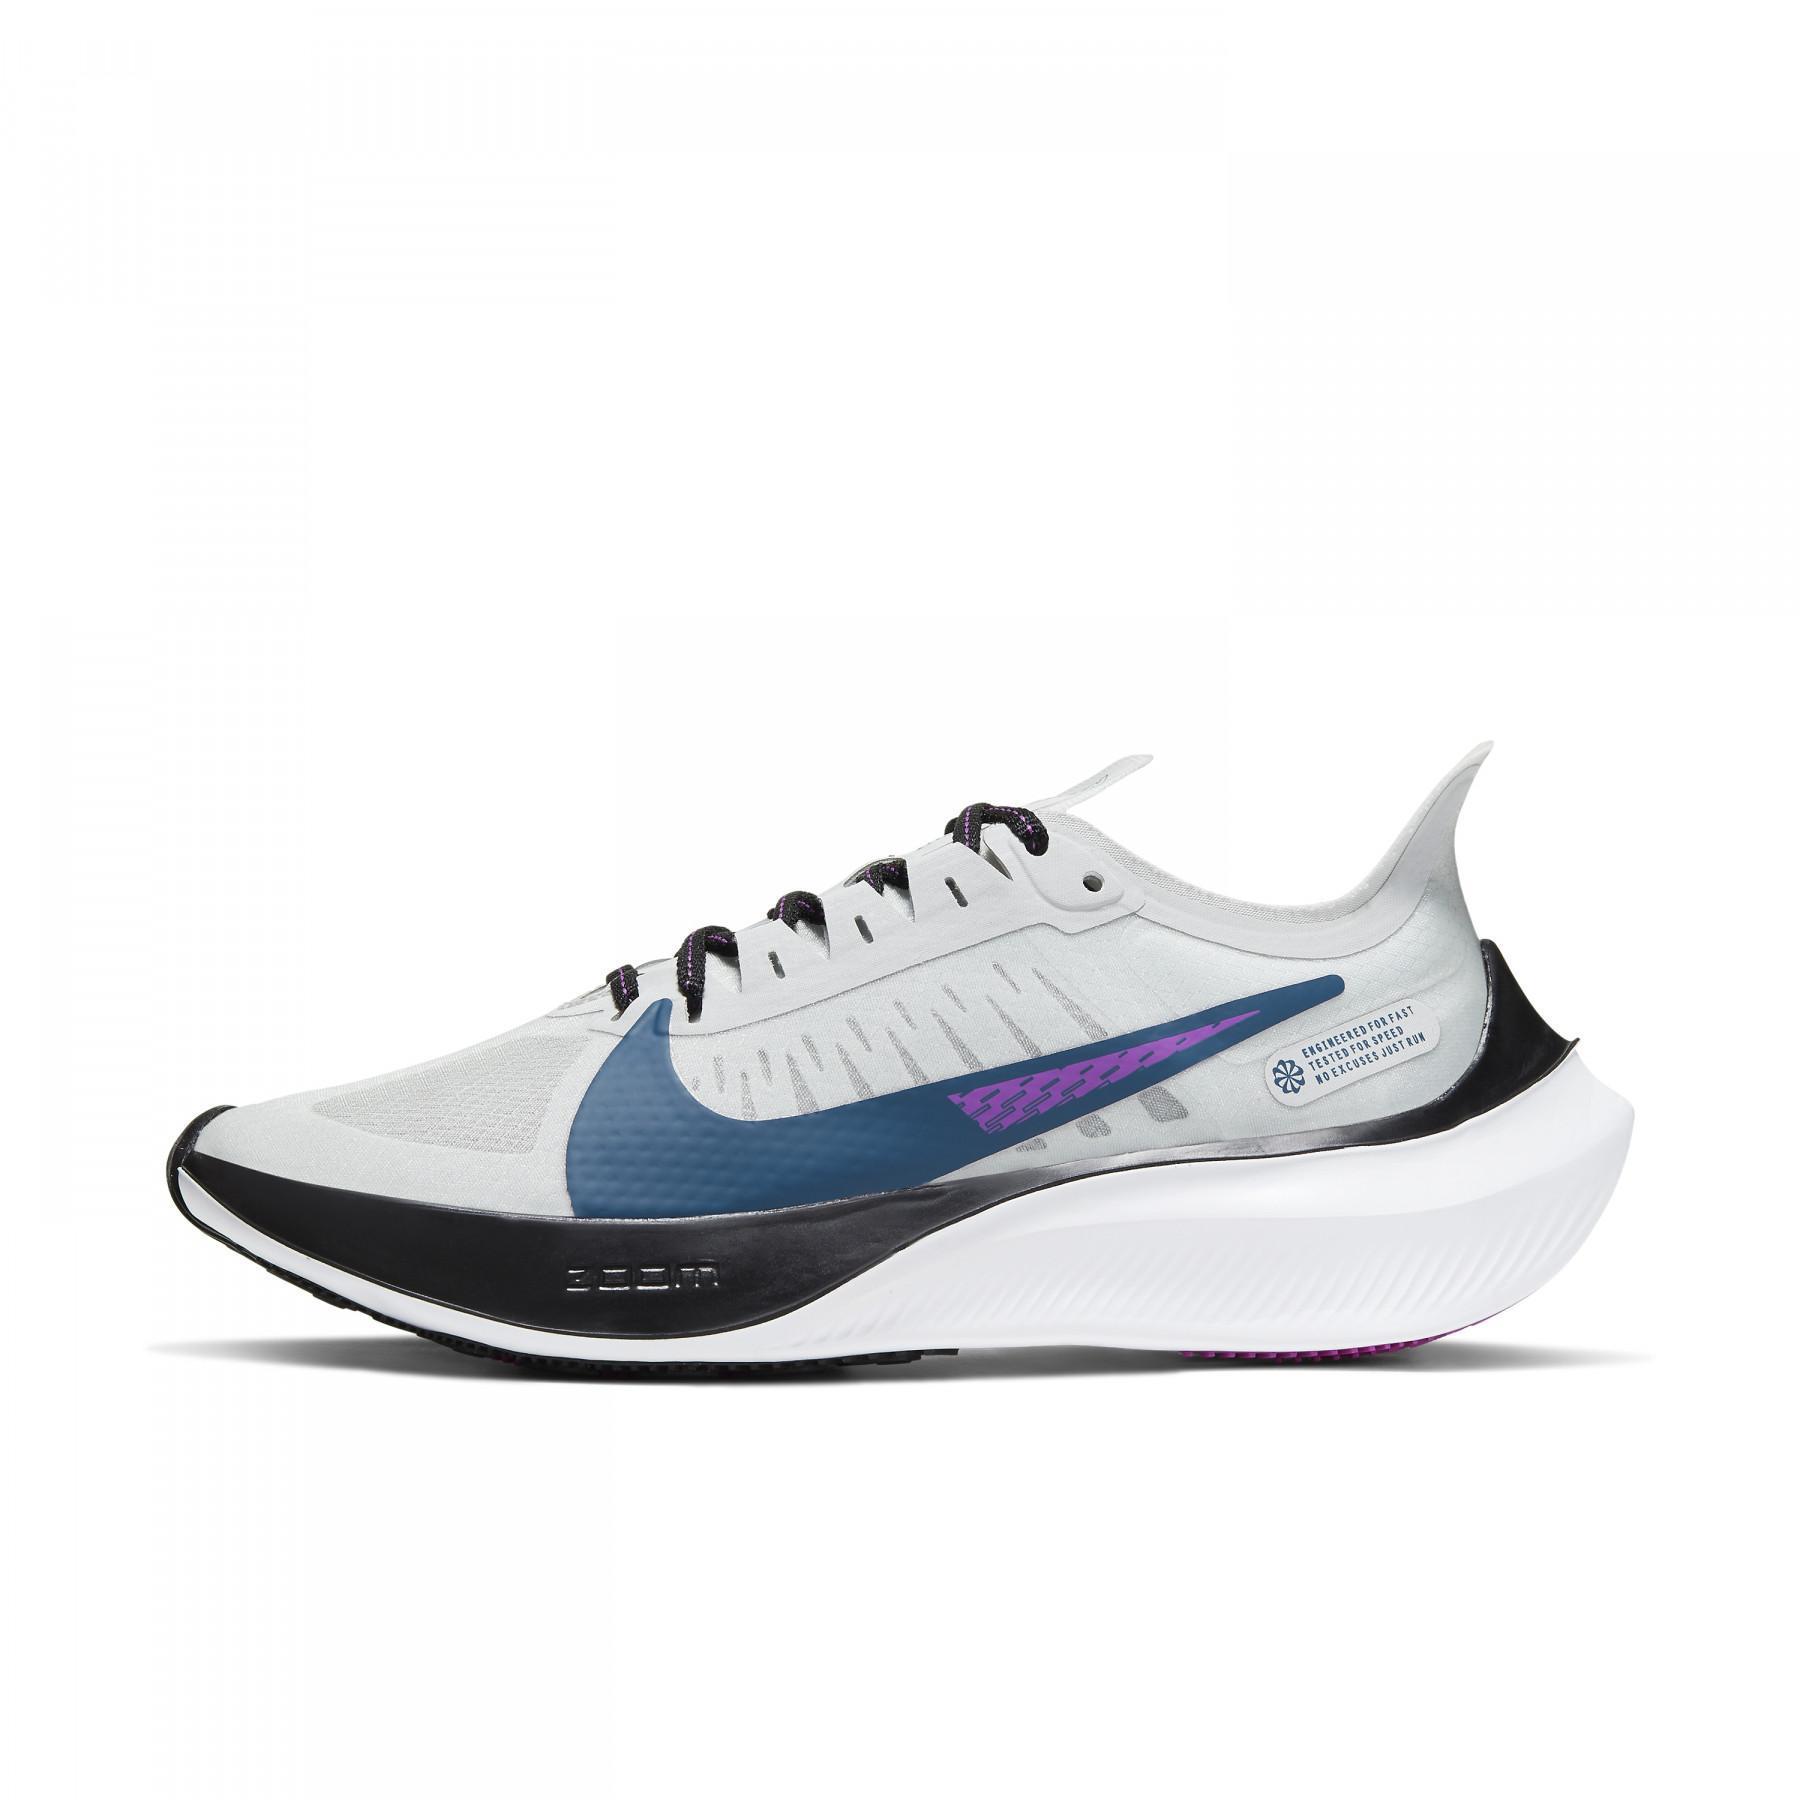 Women's shoes Nike Zoom Gravity